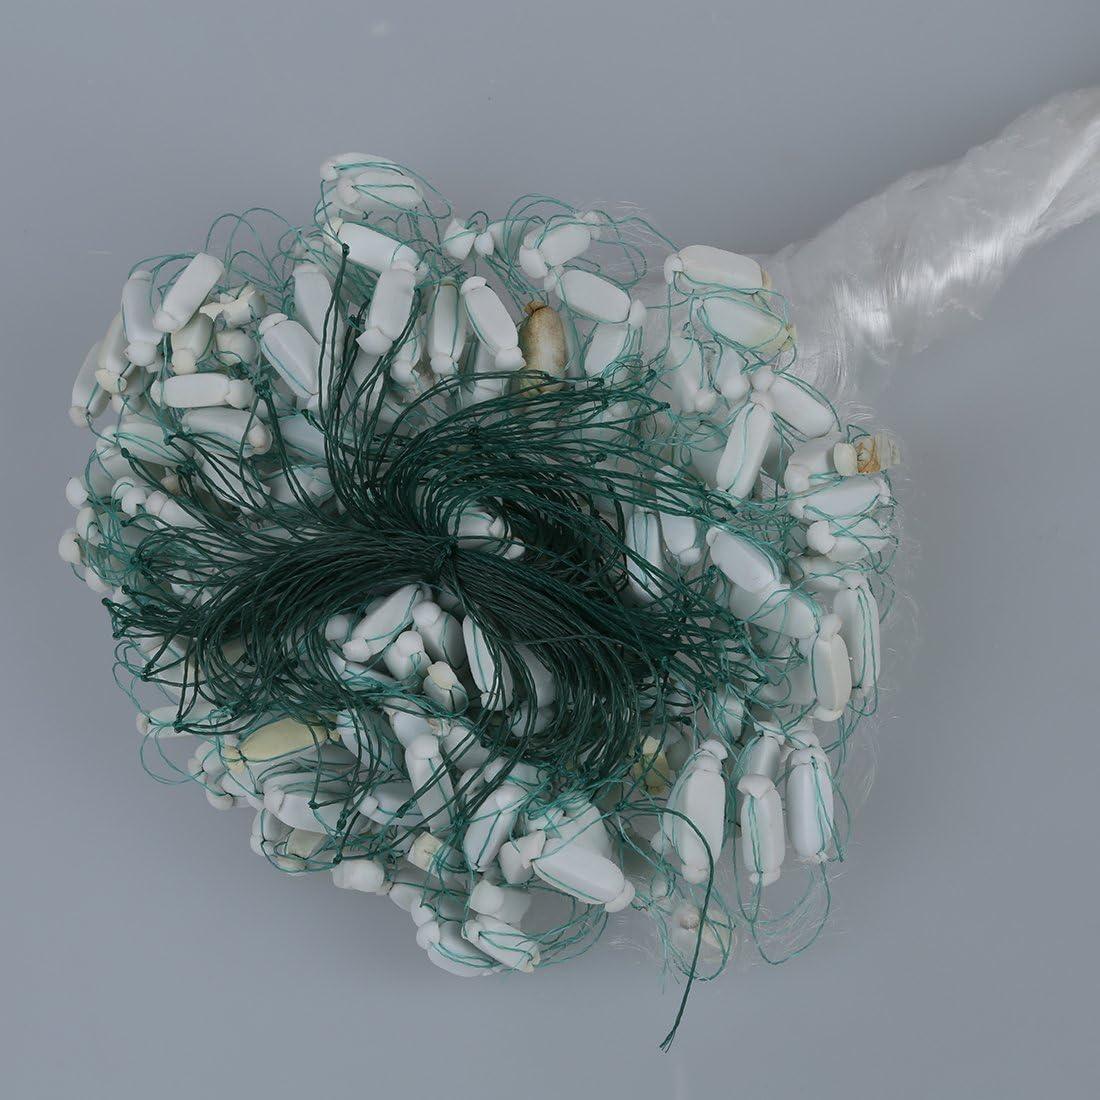 Tiamu 25m Blanco Claro Verde Red de enmalle de Pesca Pescar de monofilamento con Flotador